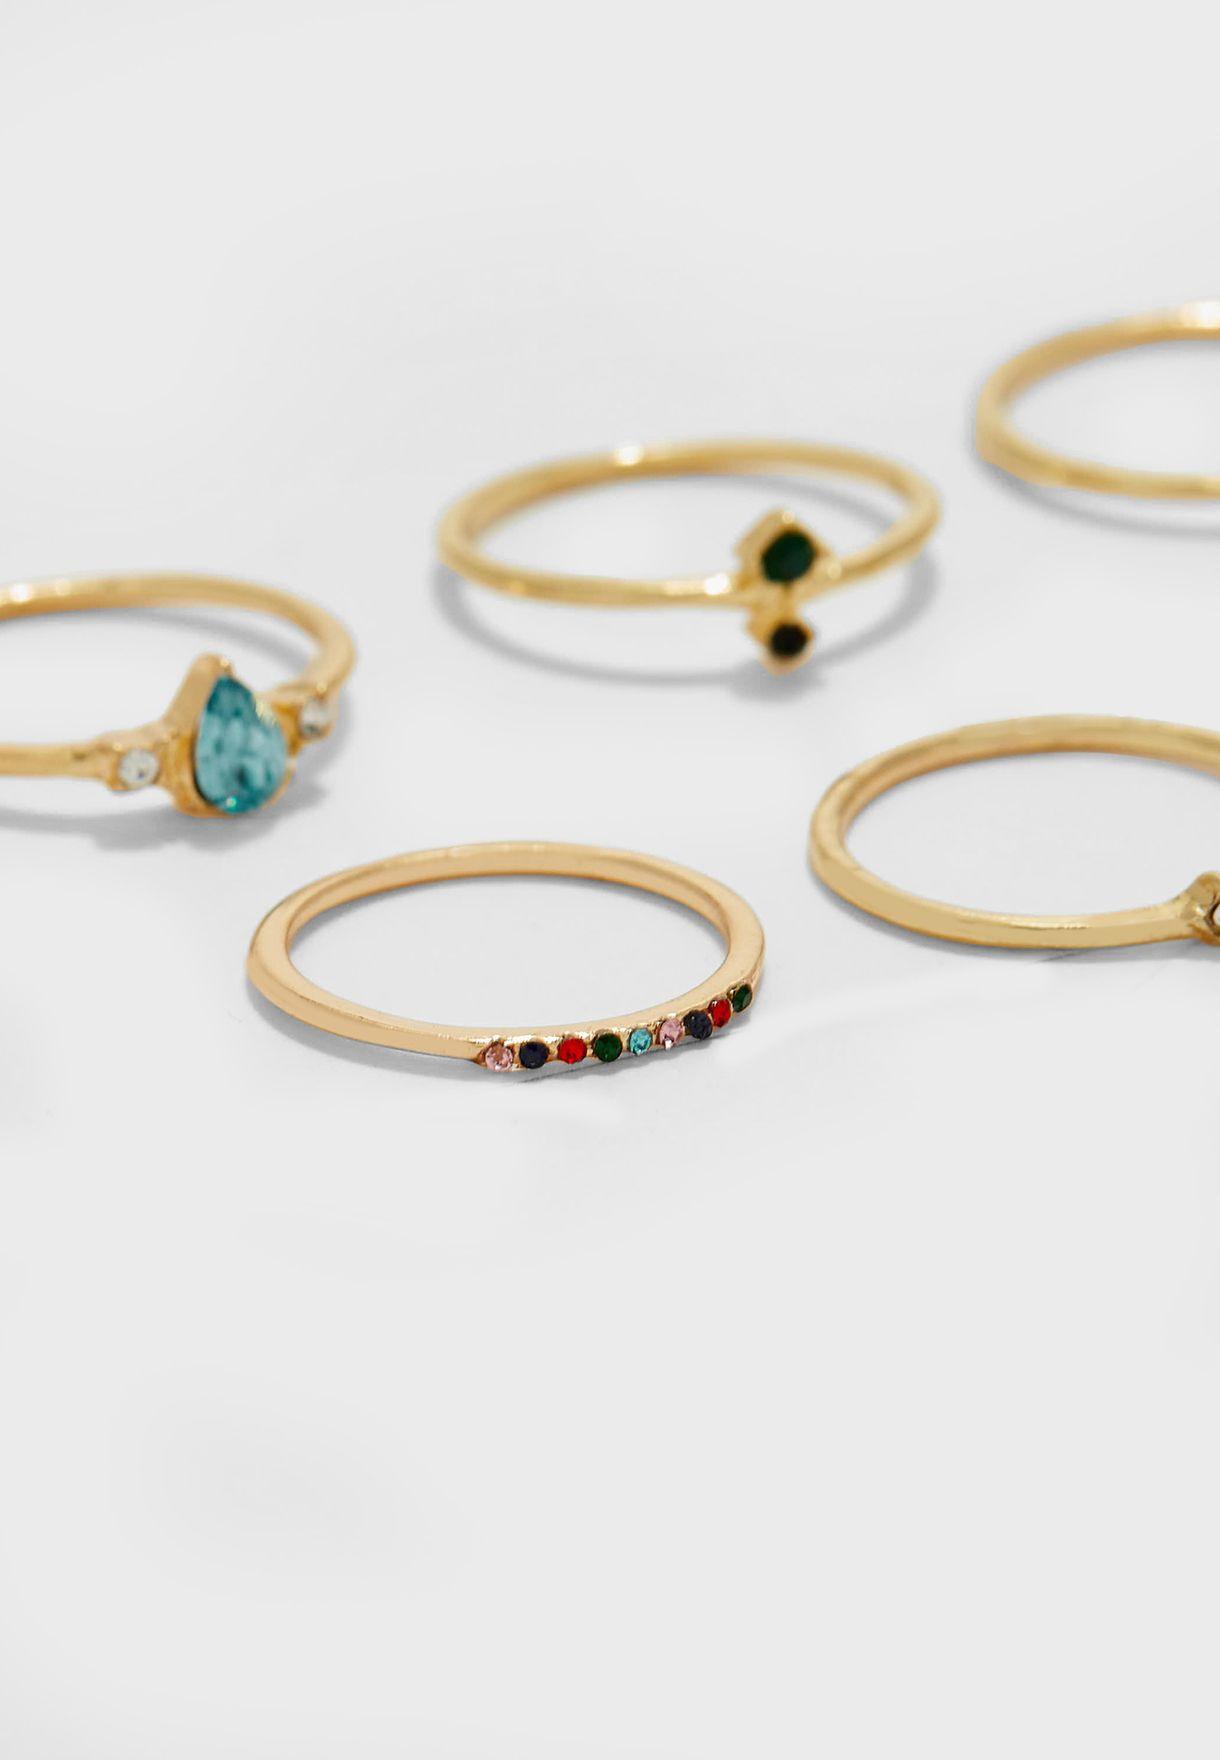 8 Pack Mixed Gem Stone Ring Set